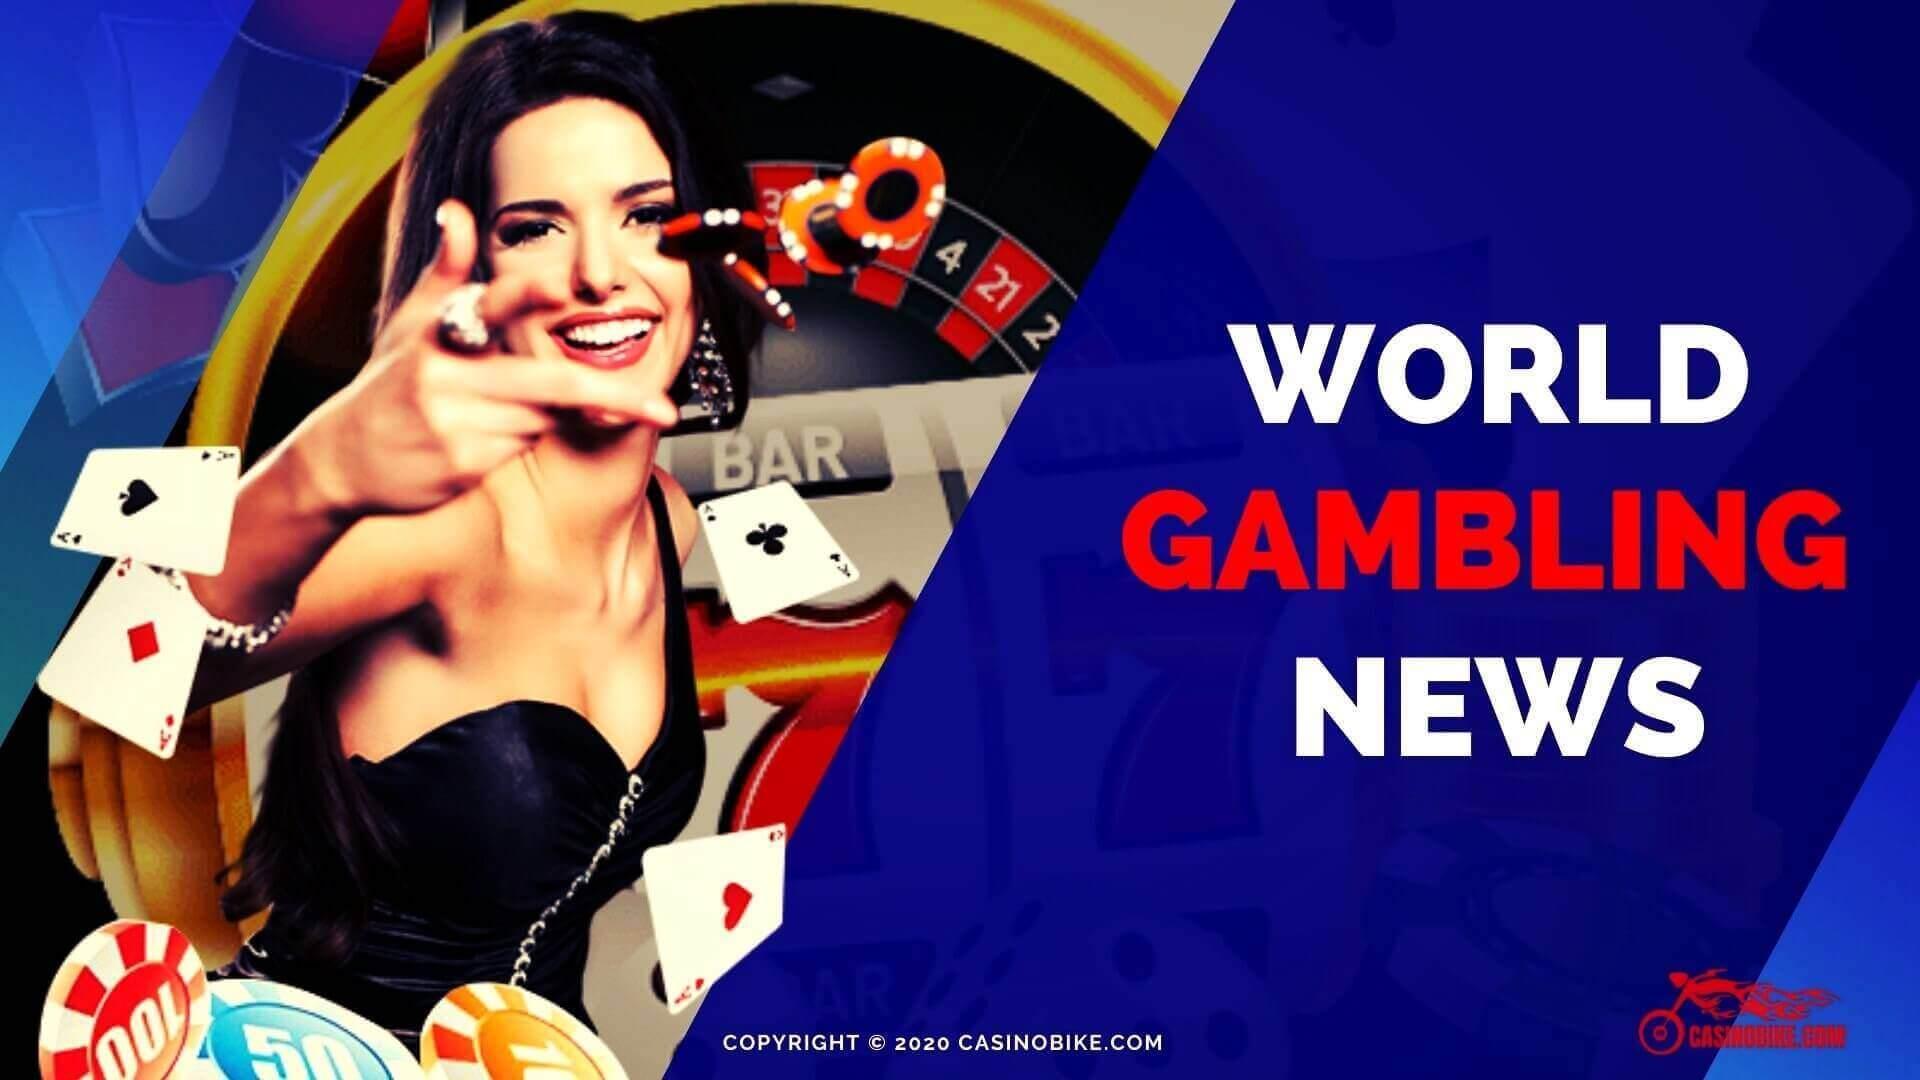 World Gambling News